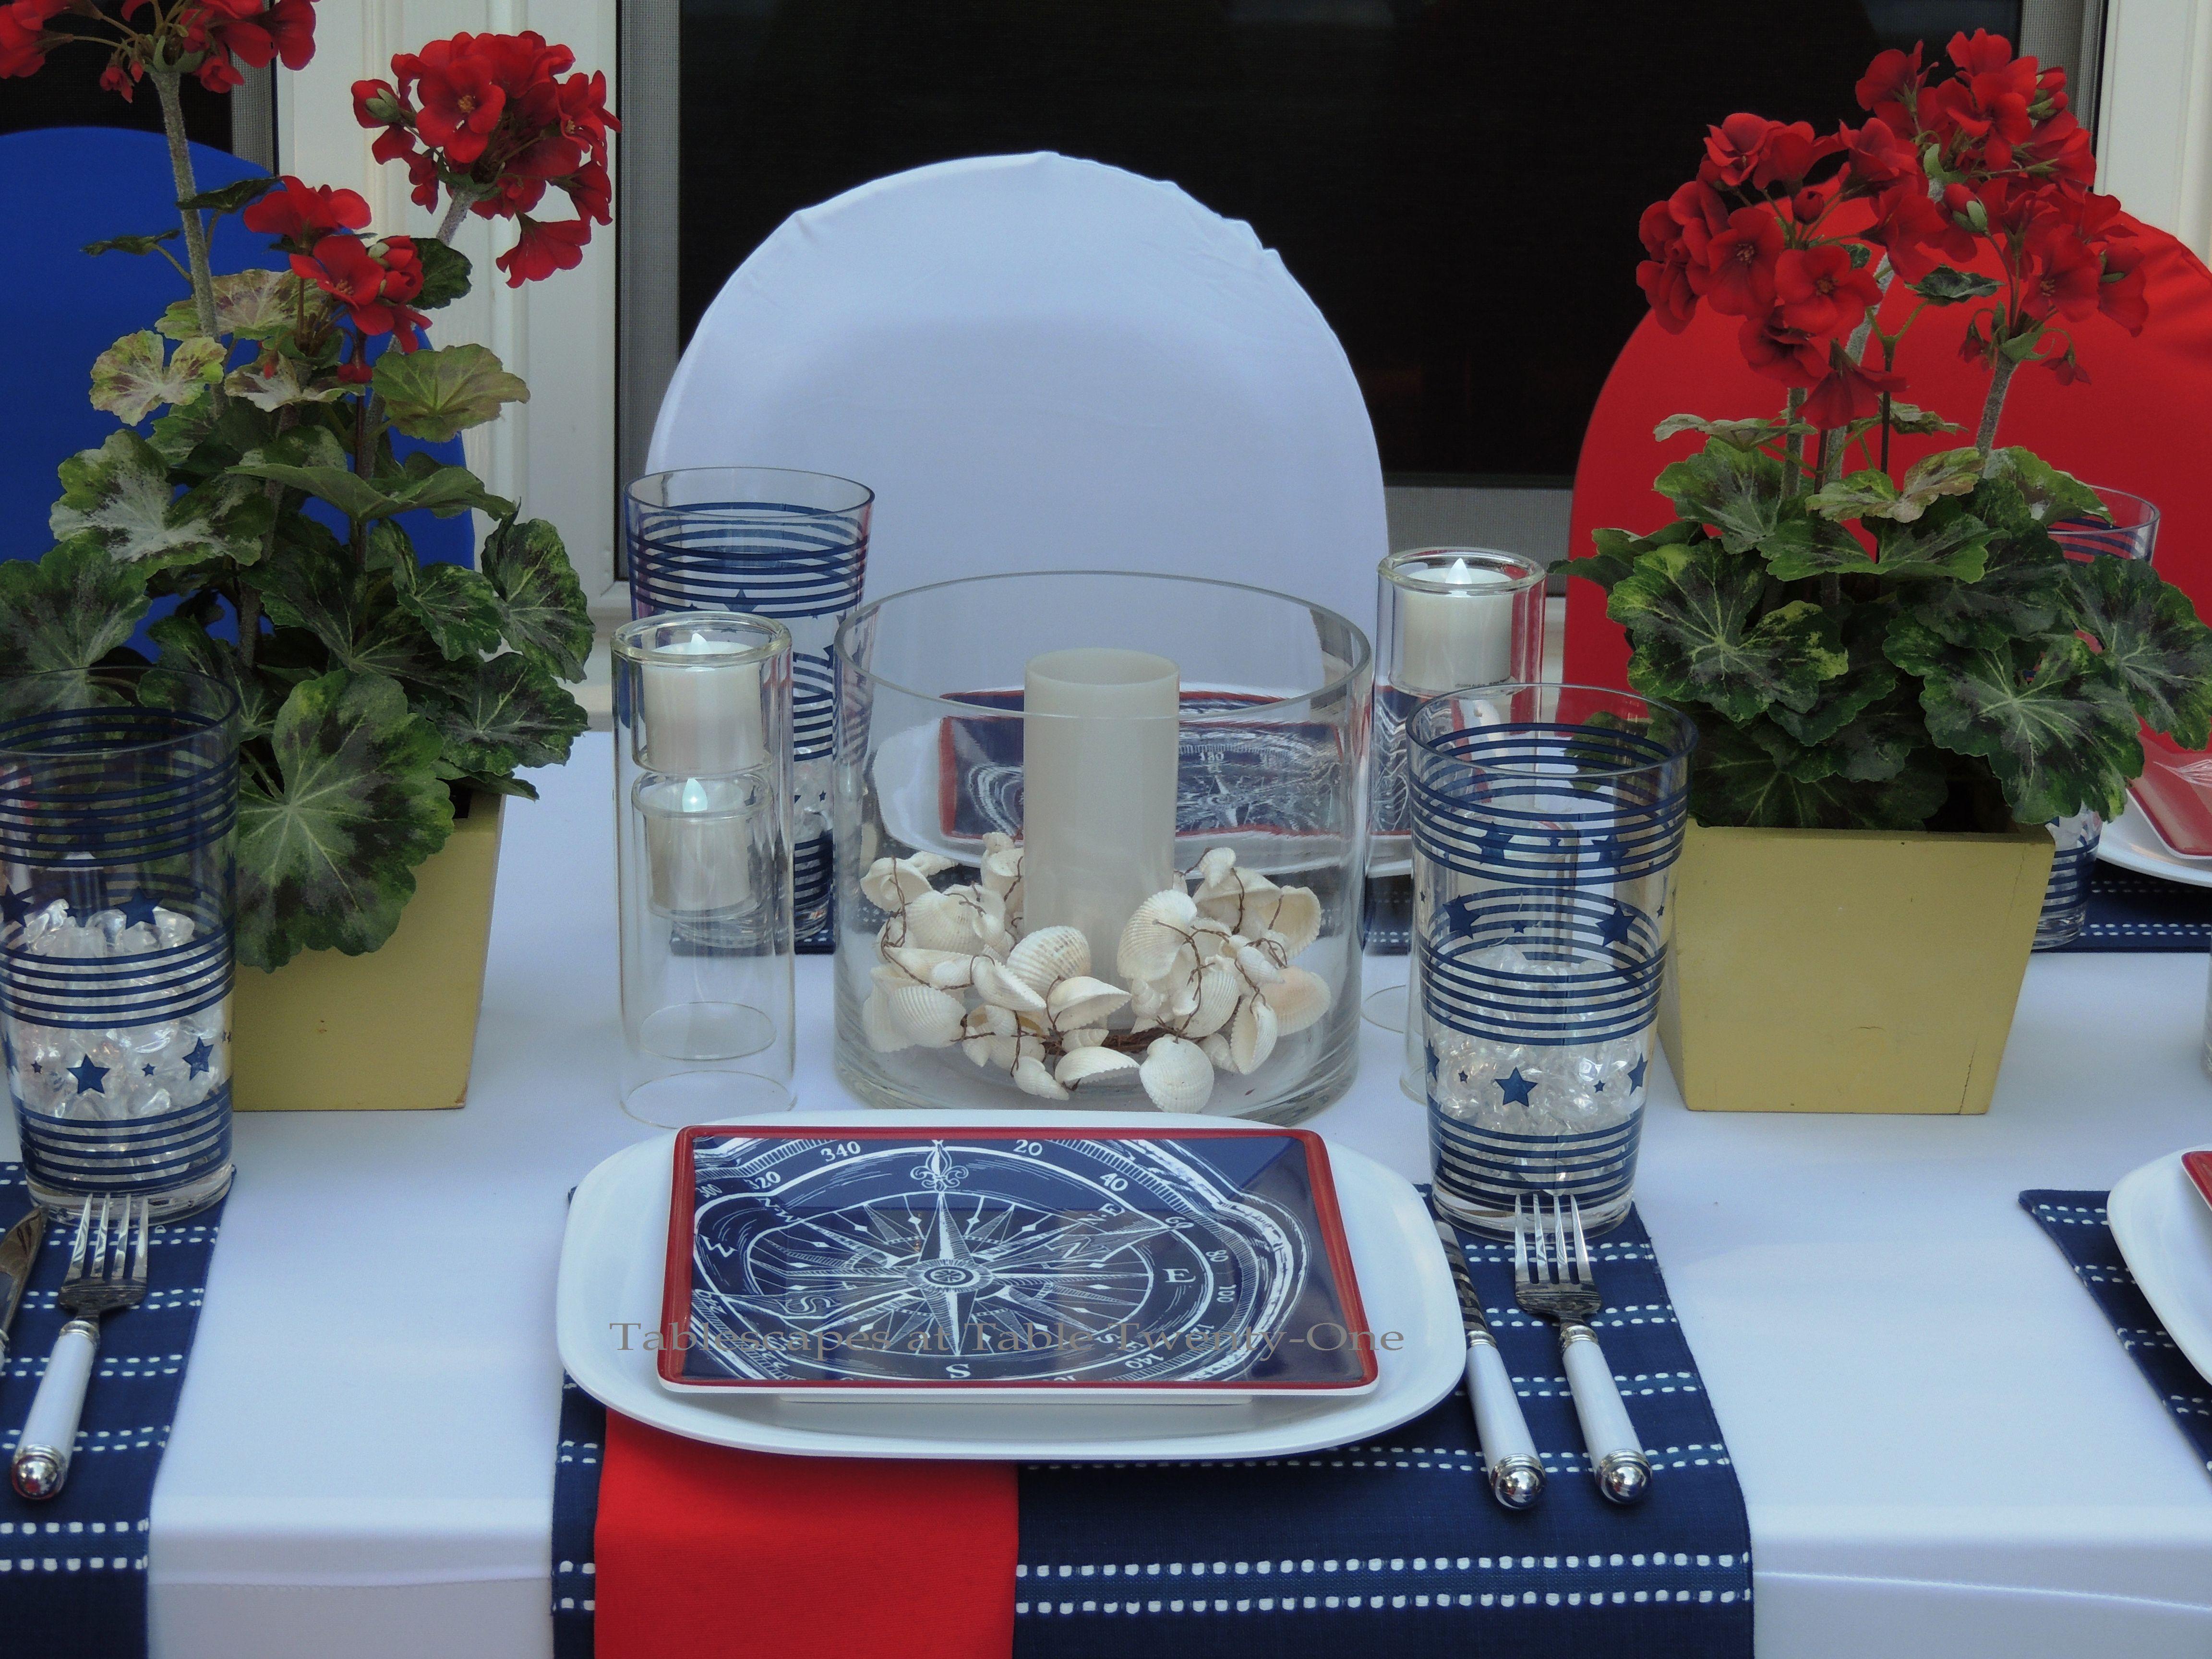 Tablescapes at Table Twenty-One, www.tabletwentyone.wordpress.com, 4th of July Coastal Style: single place setting